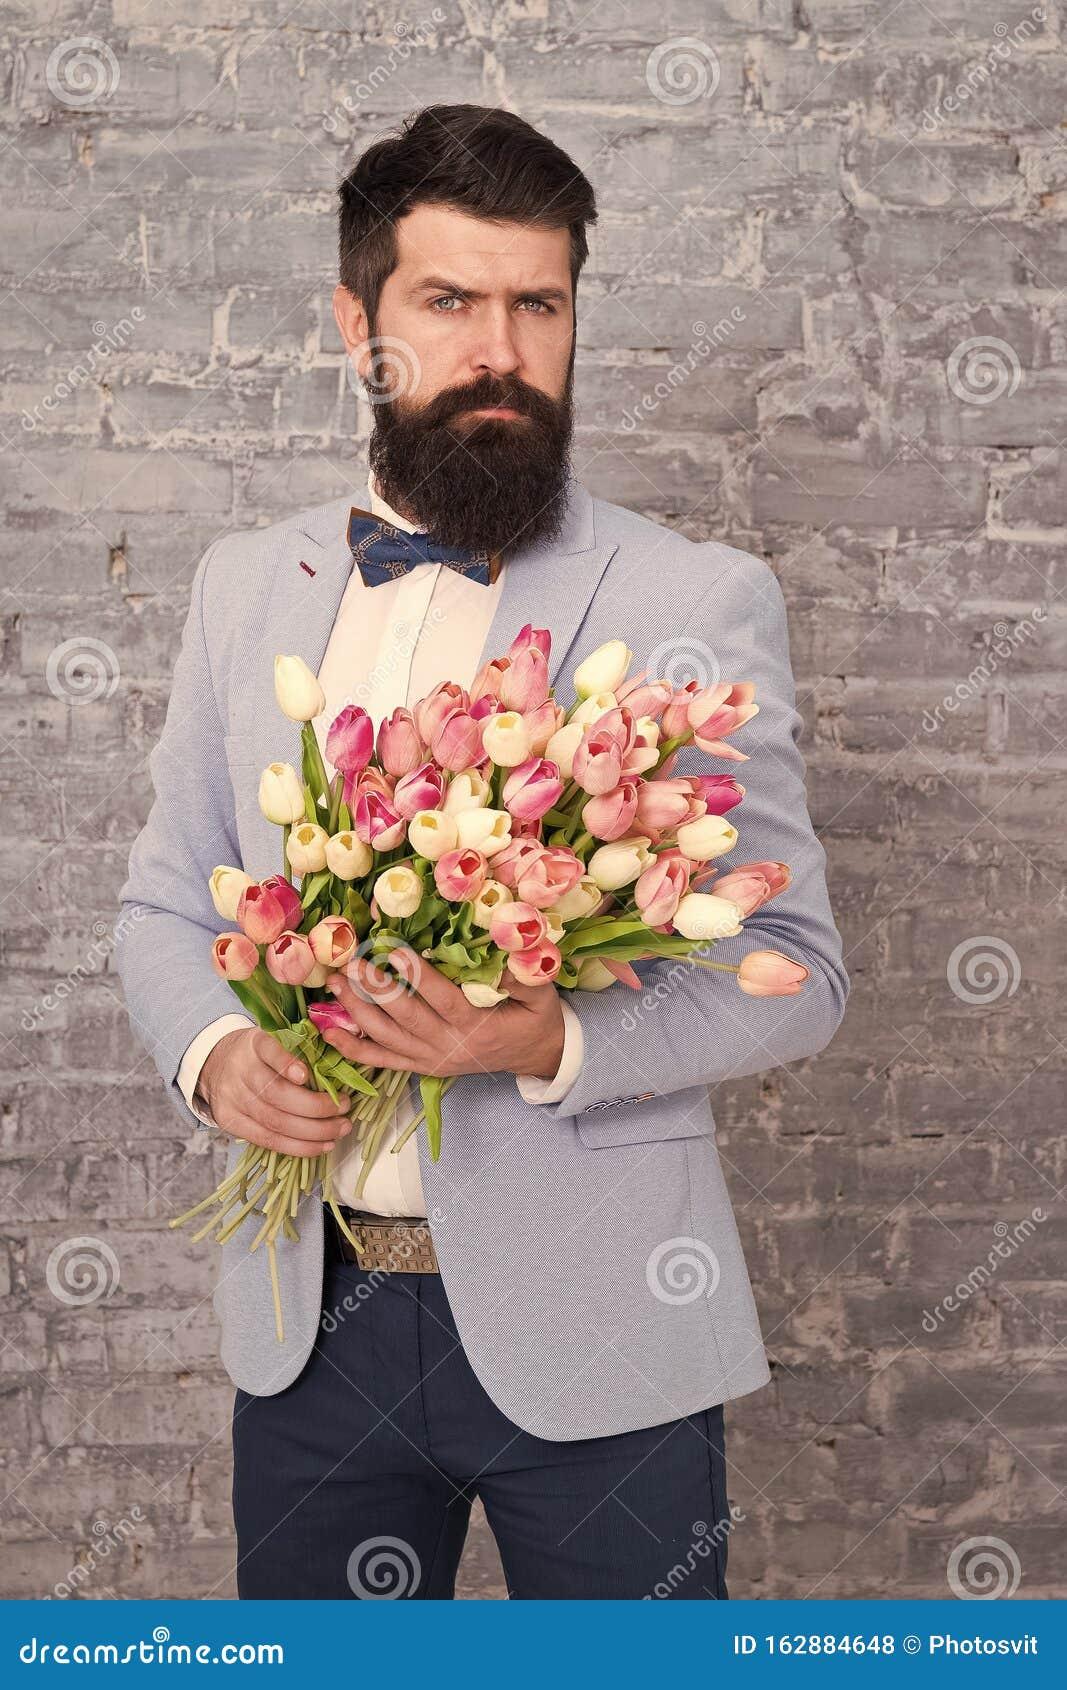 Dating Man Flower